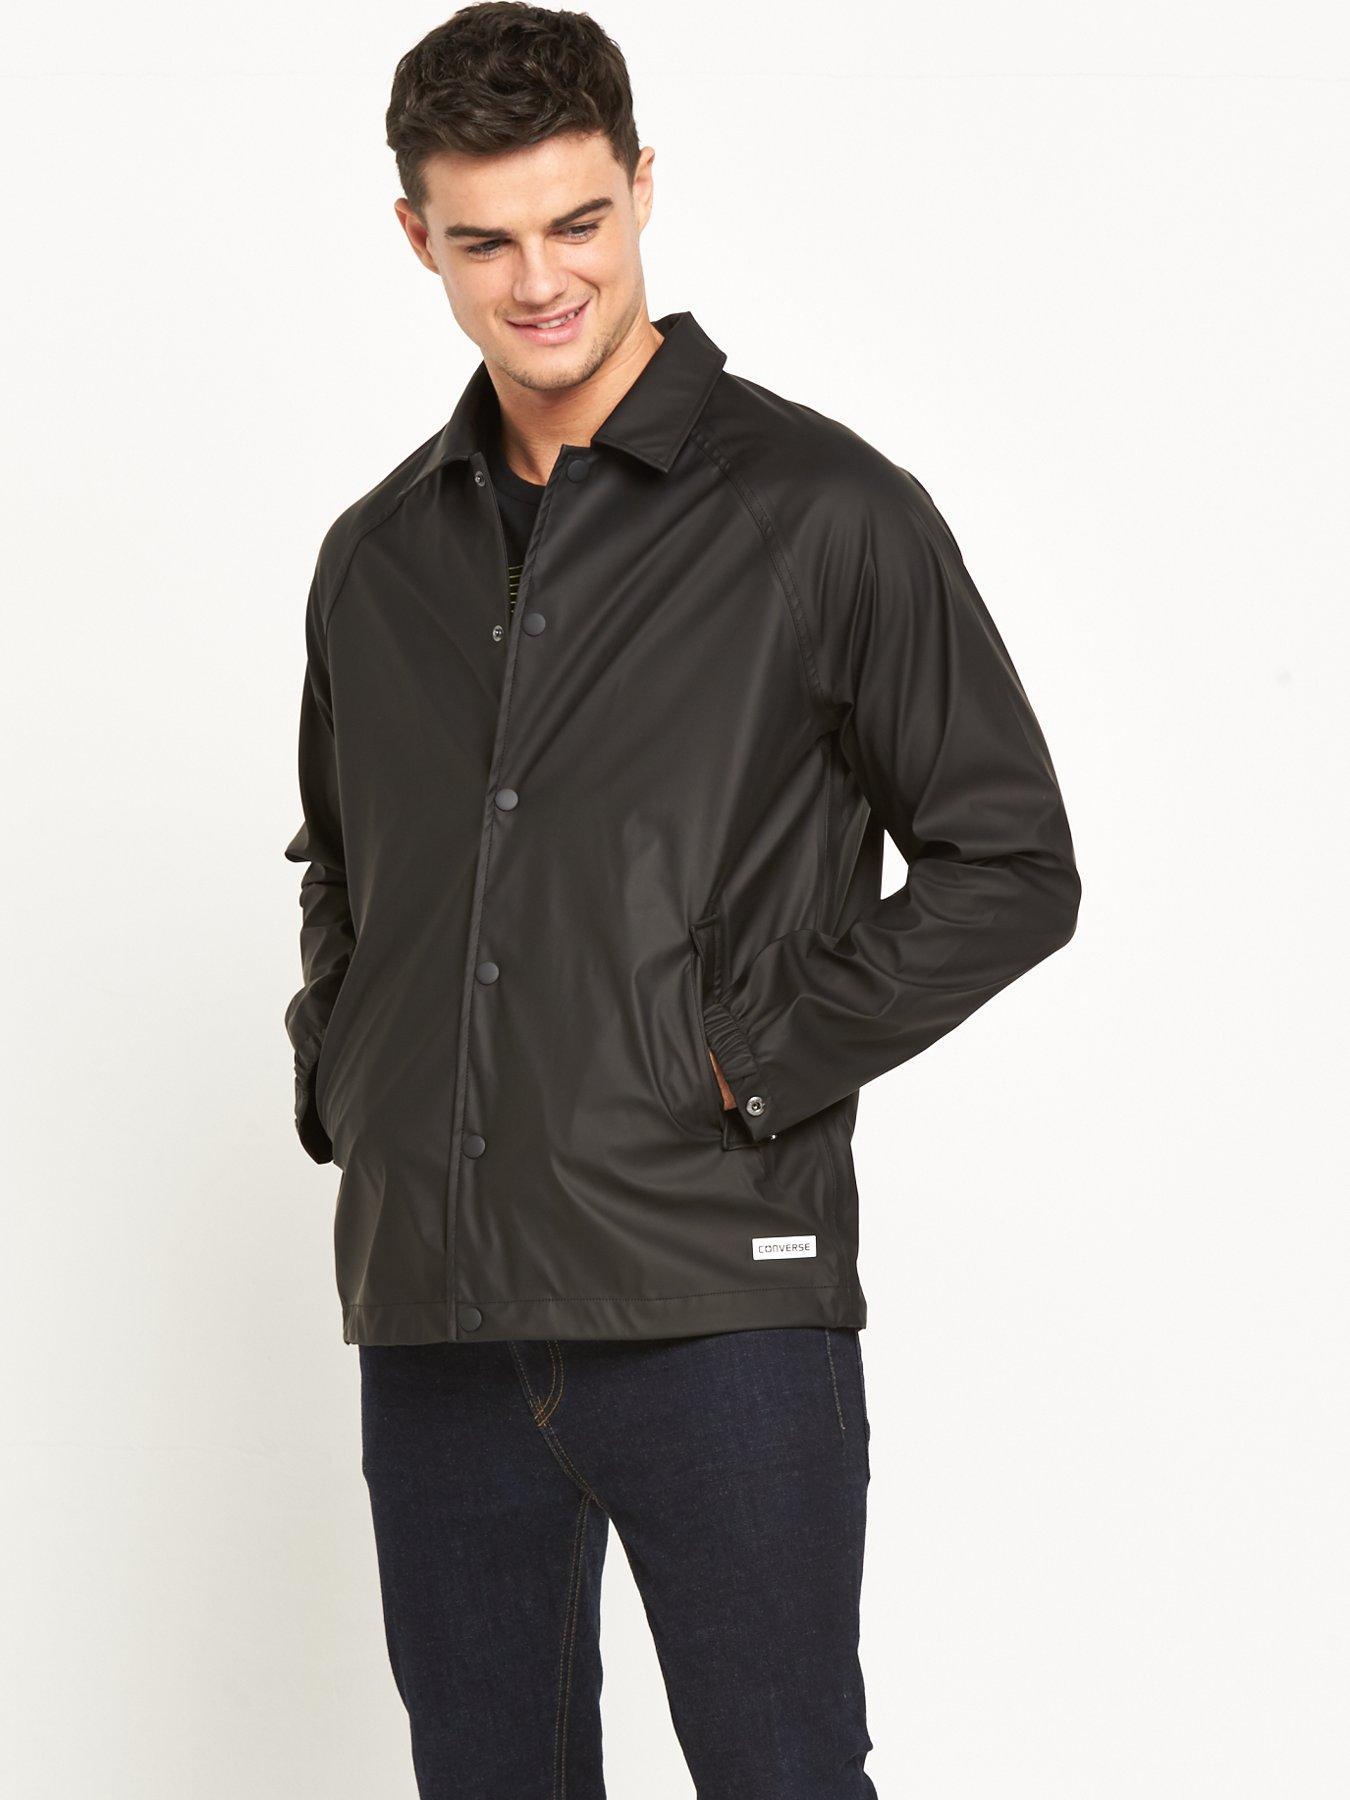 converse coach jacket